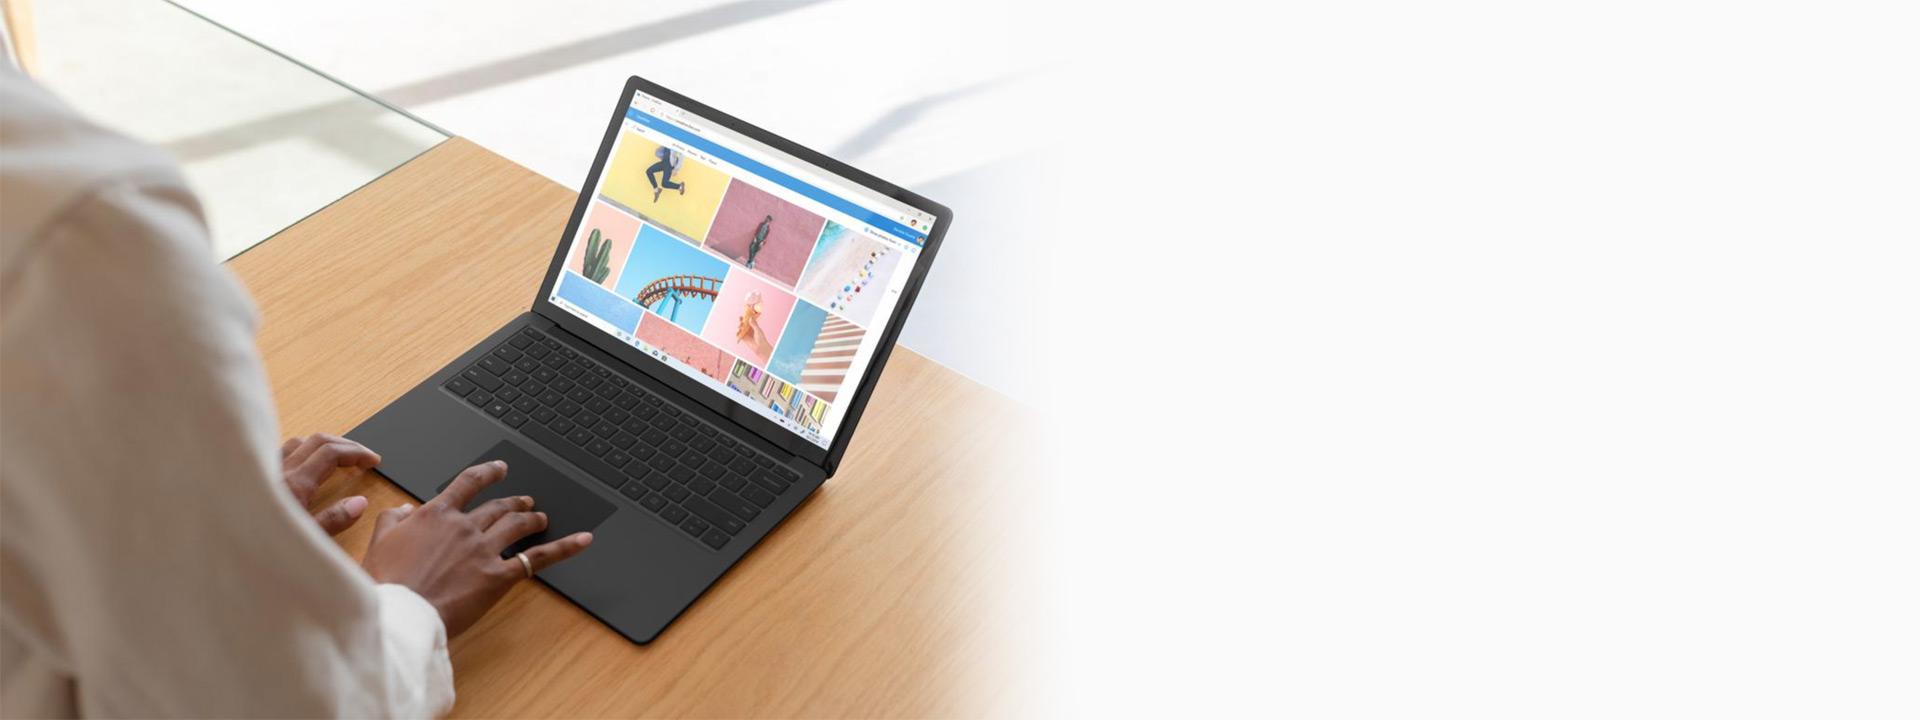 Surface Laptop 3 en negro